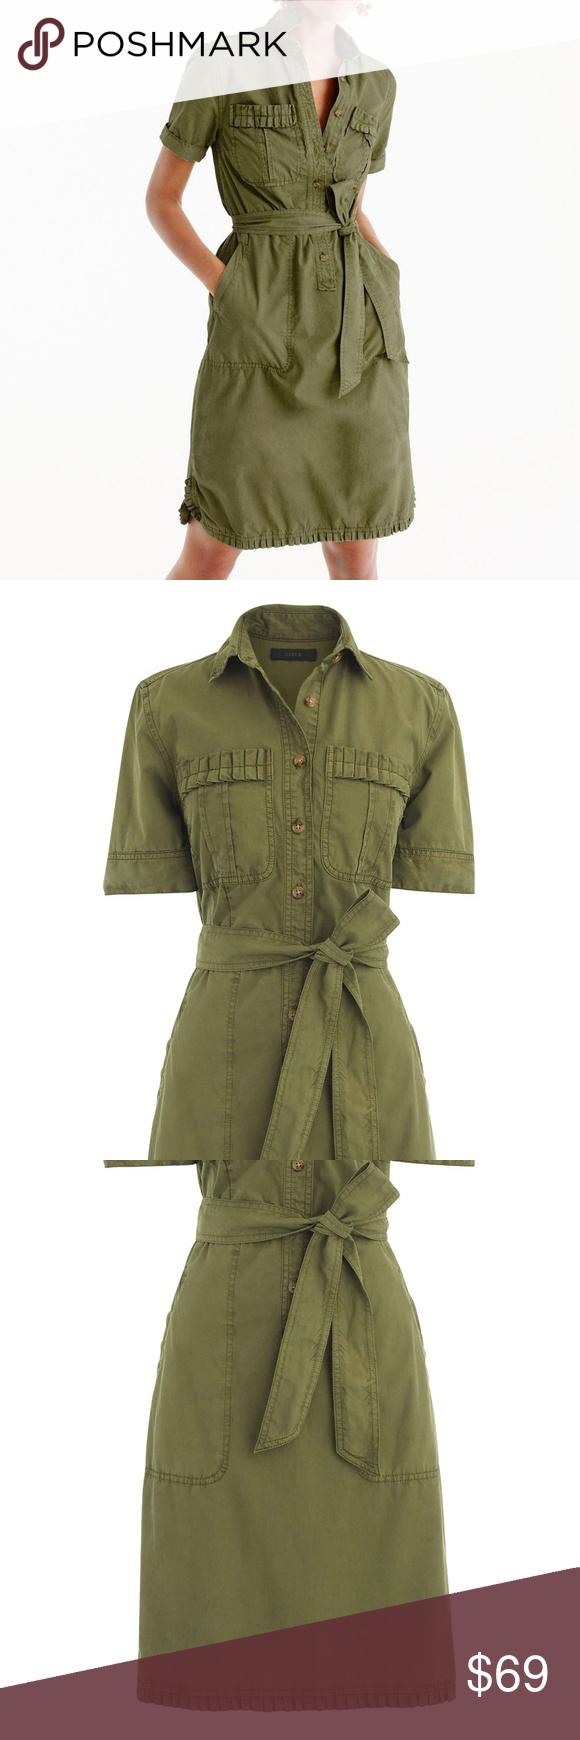 4b0e5cb457 J.Crew Ruffle Hem Utility Shirtdress. Cute utility dress with feminine  ruffles. -